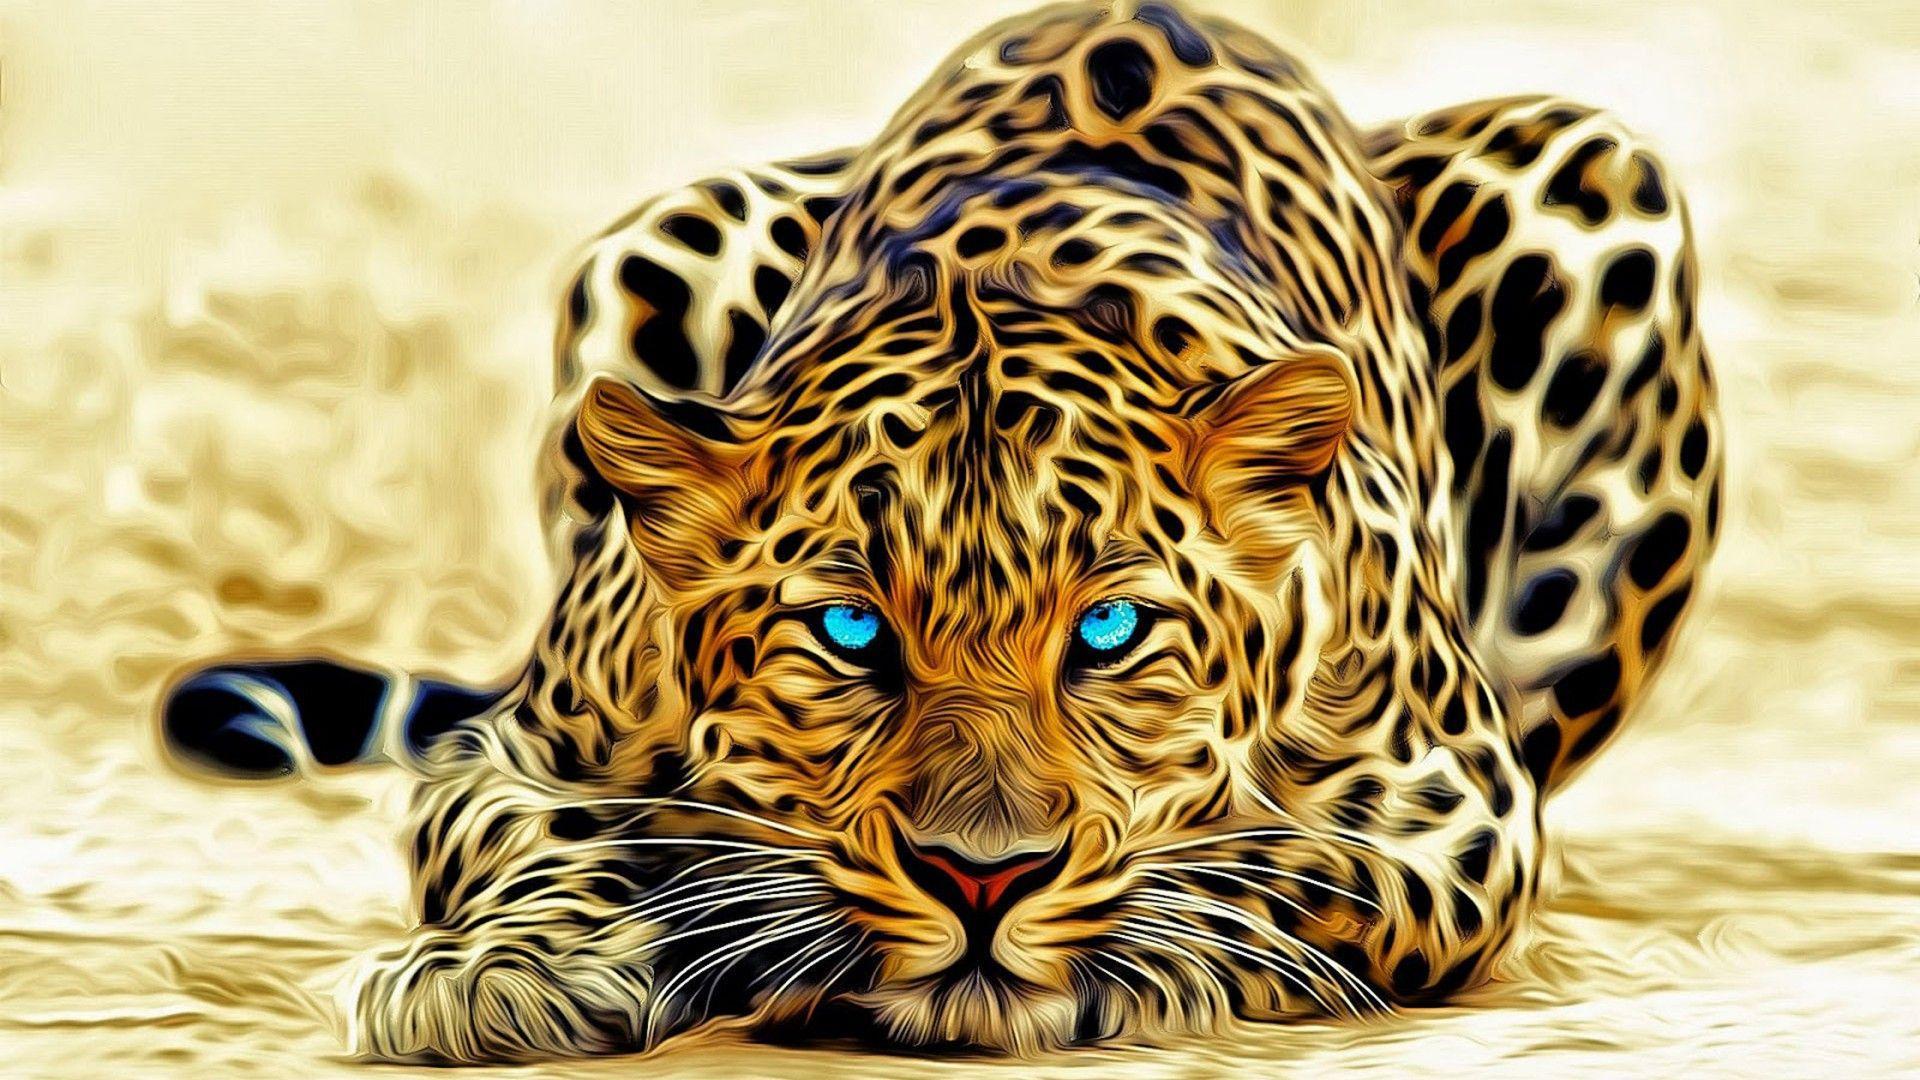 Cheetah Backgrounds